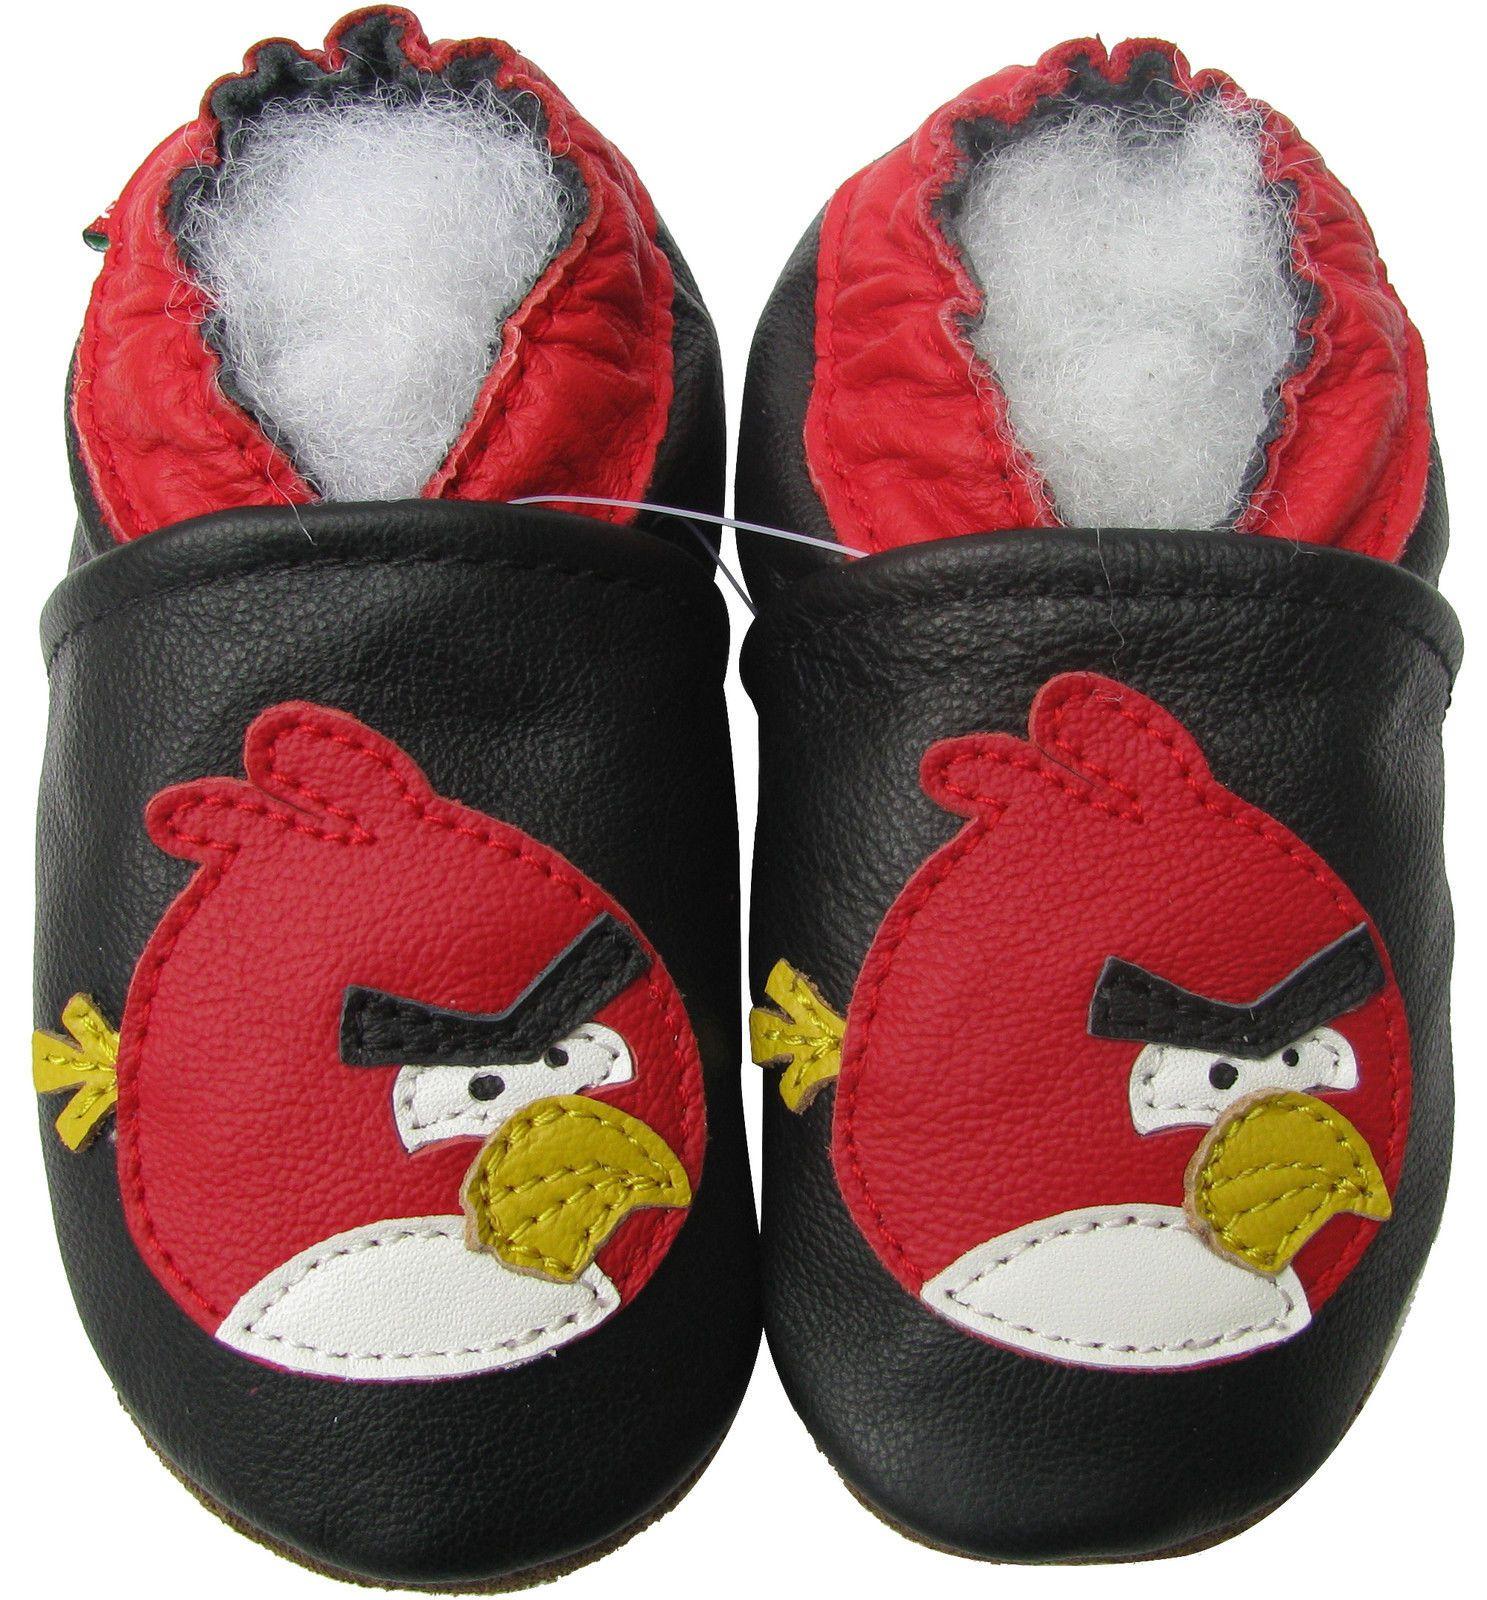 Carozoo Wolf Black Baby Boy Soft Sole Leather Shoes